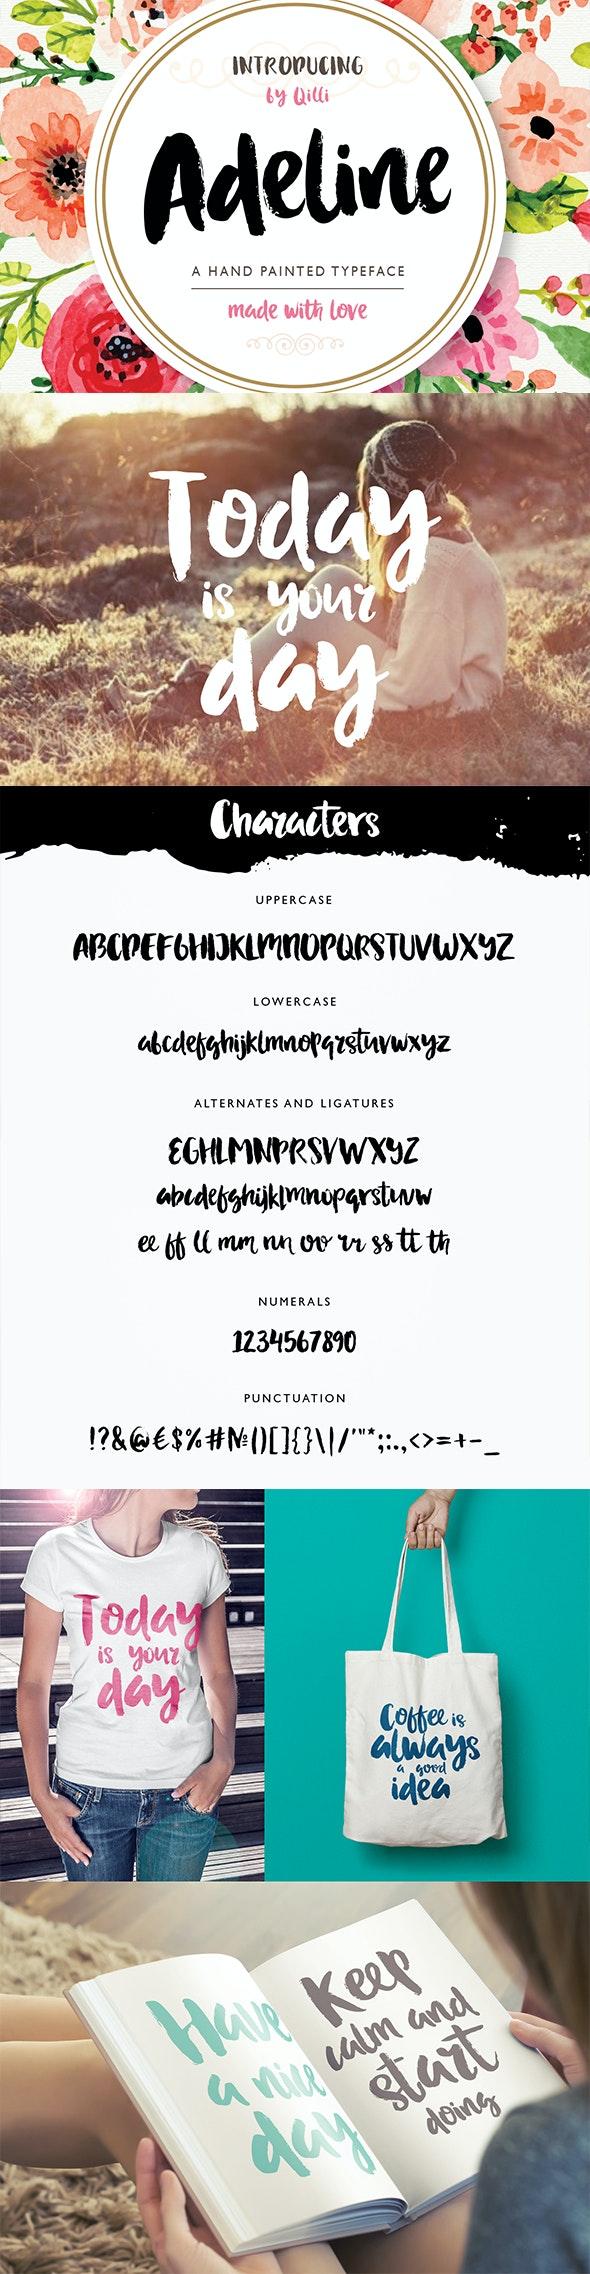 Adeline Typeface - Brush Script - Hand-writing Script